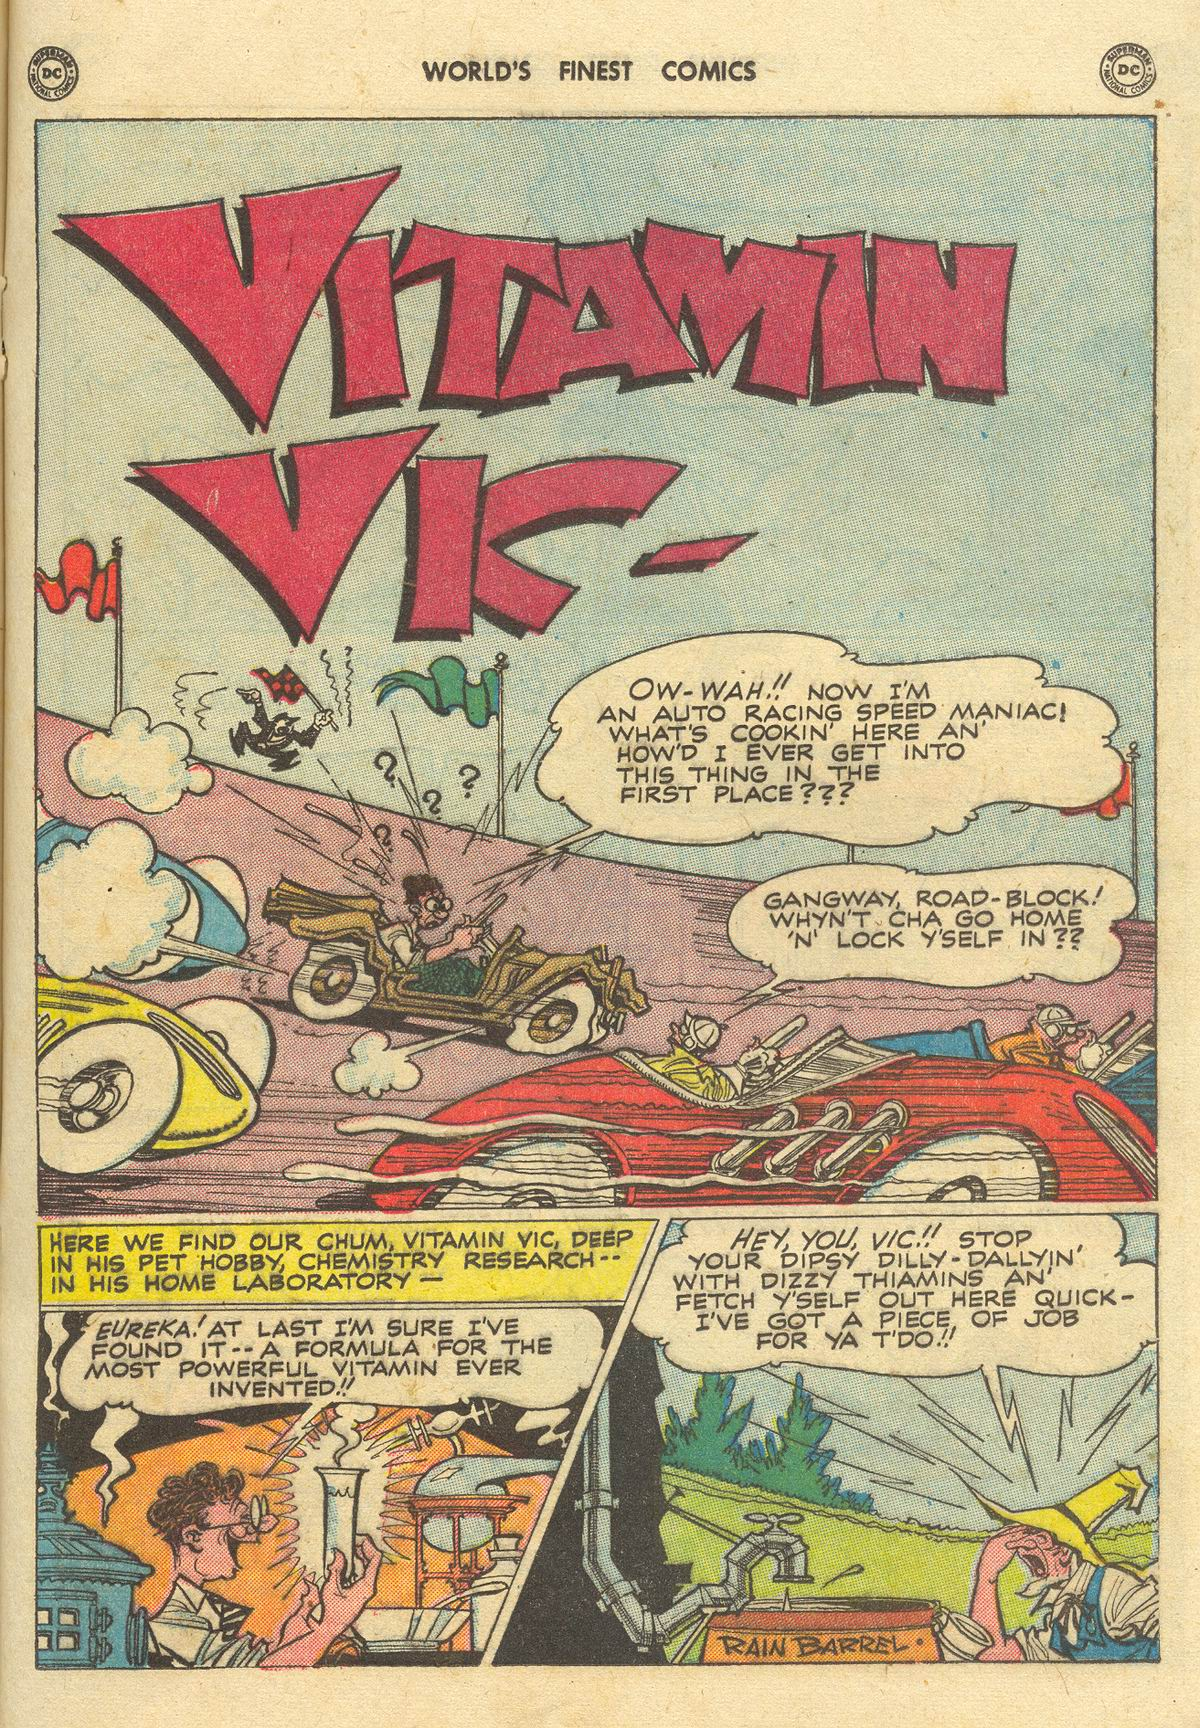 Read online World's Finest Comics comic -  Issue #51 - 37